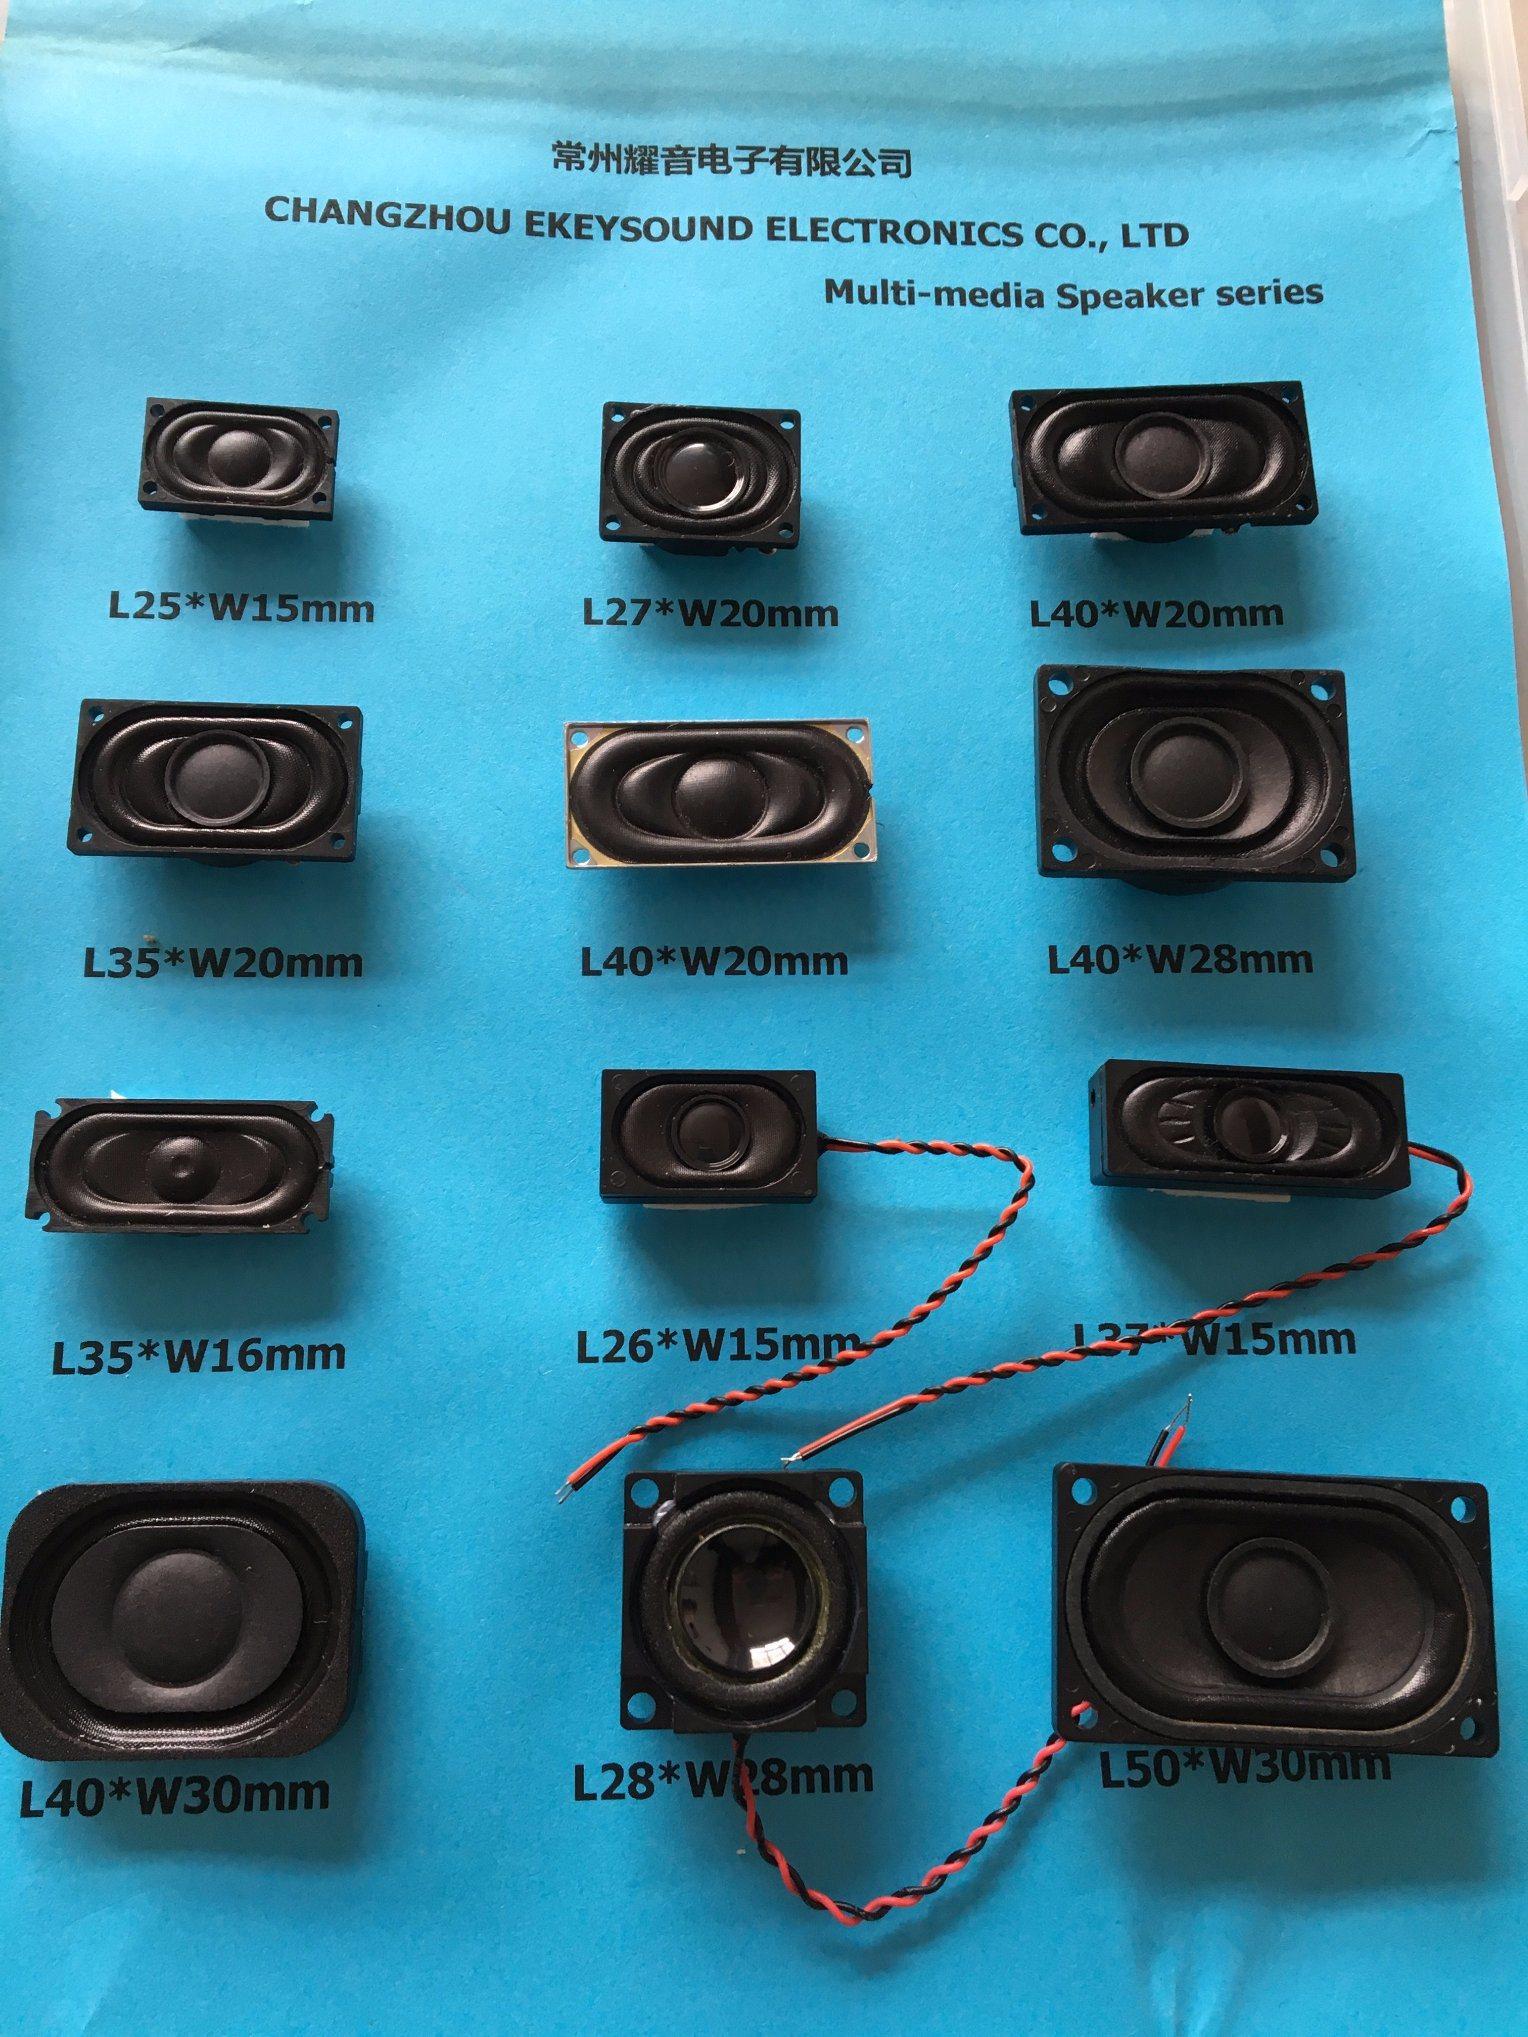 Mini Speaker Box Use for Bluetooth